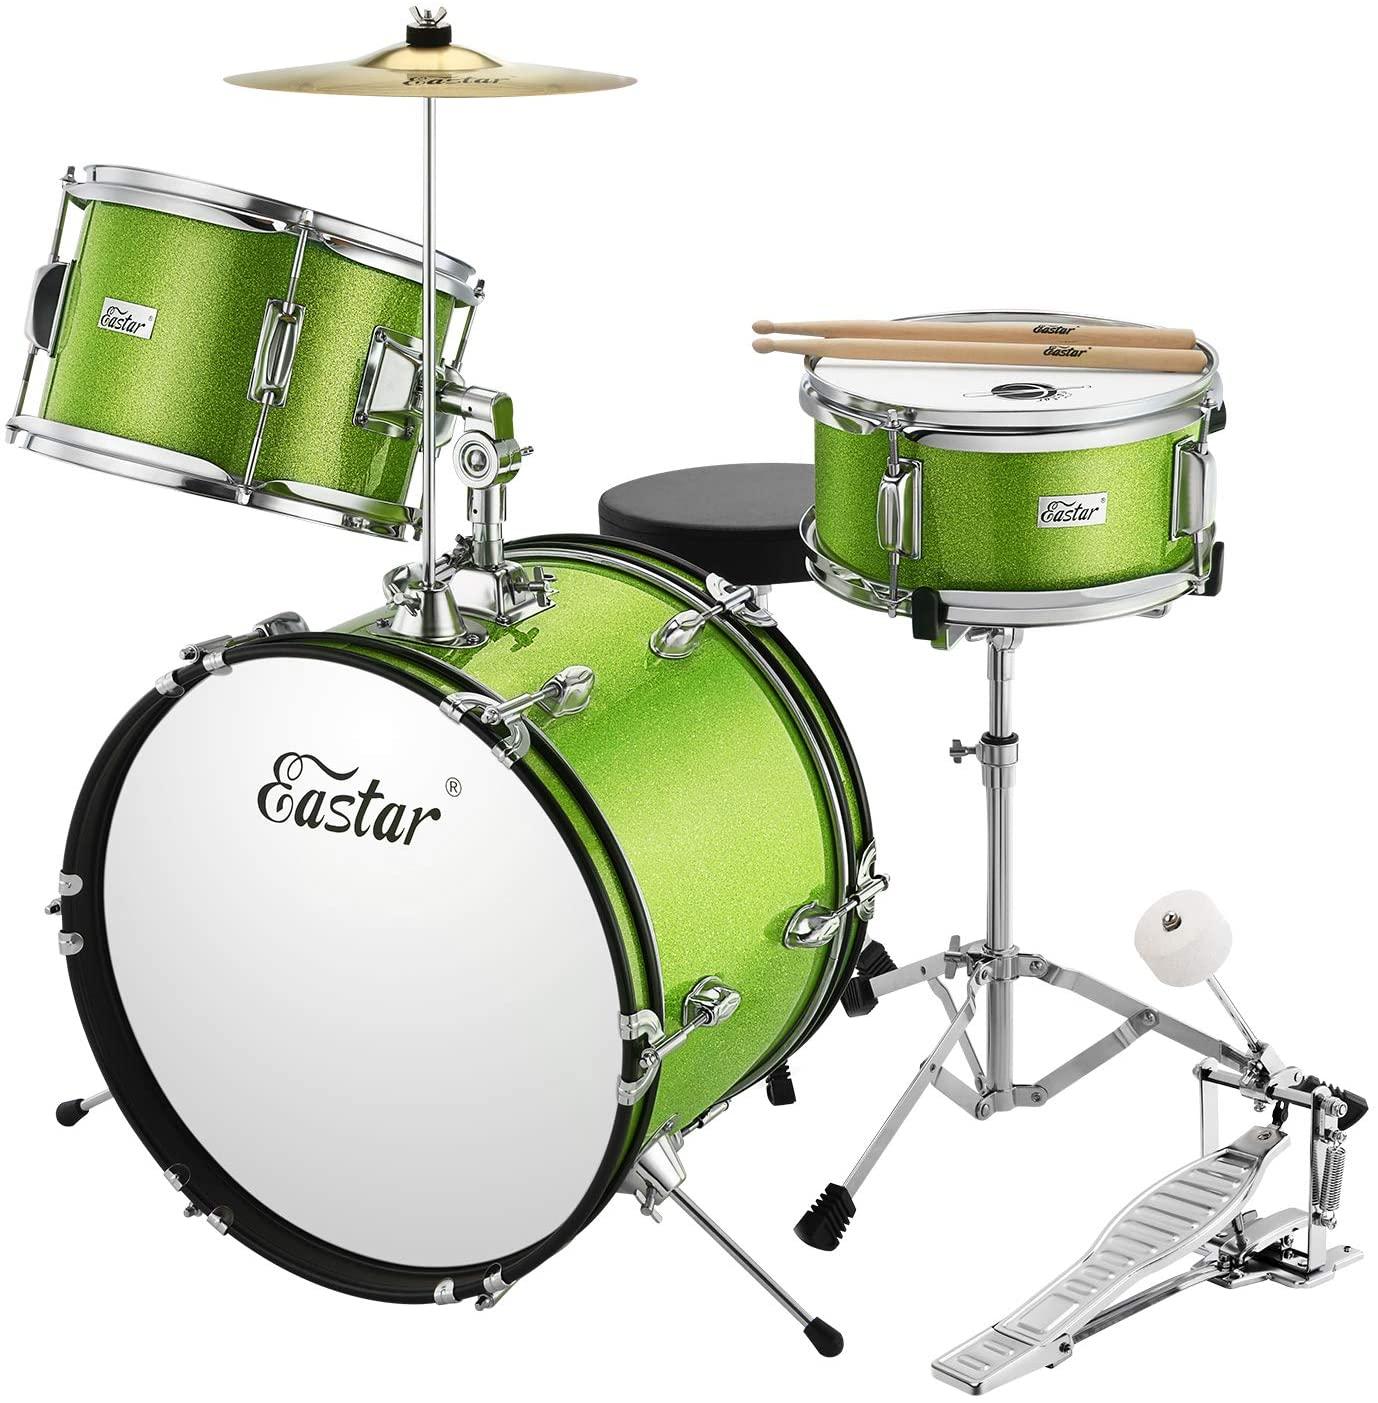 Eastar 15inch Drum Set